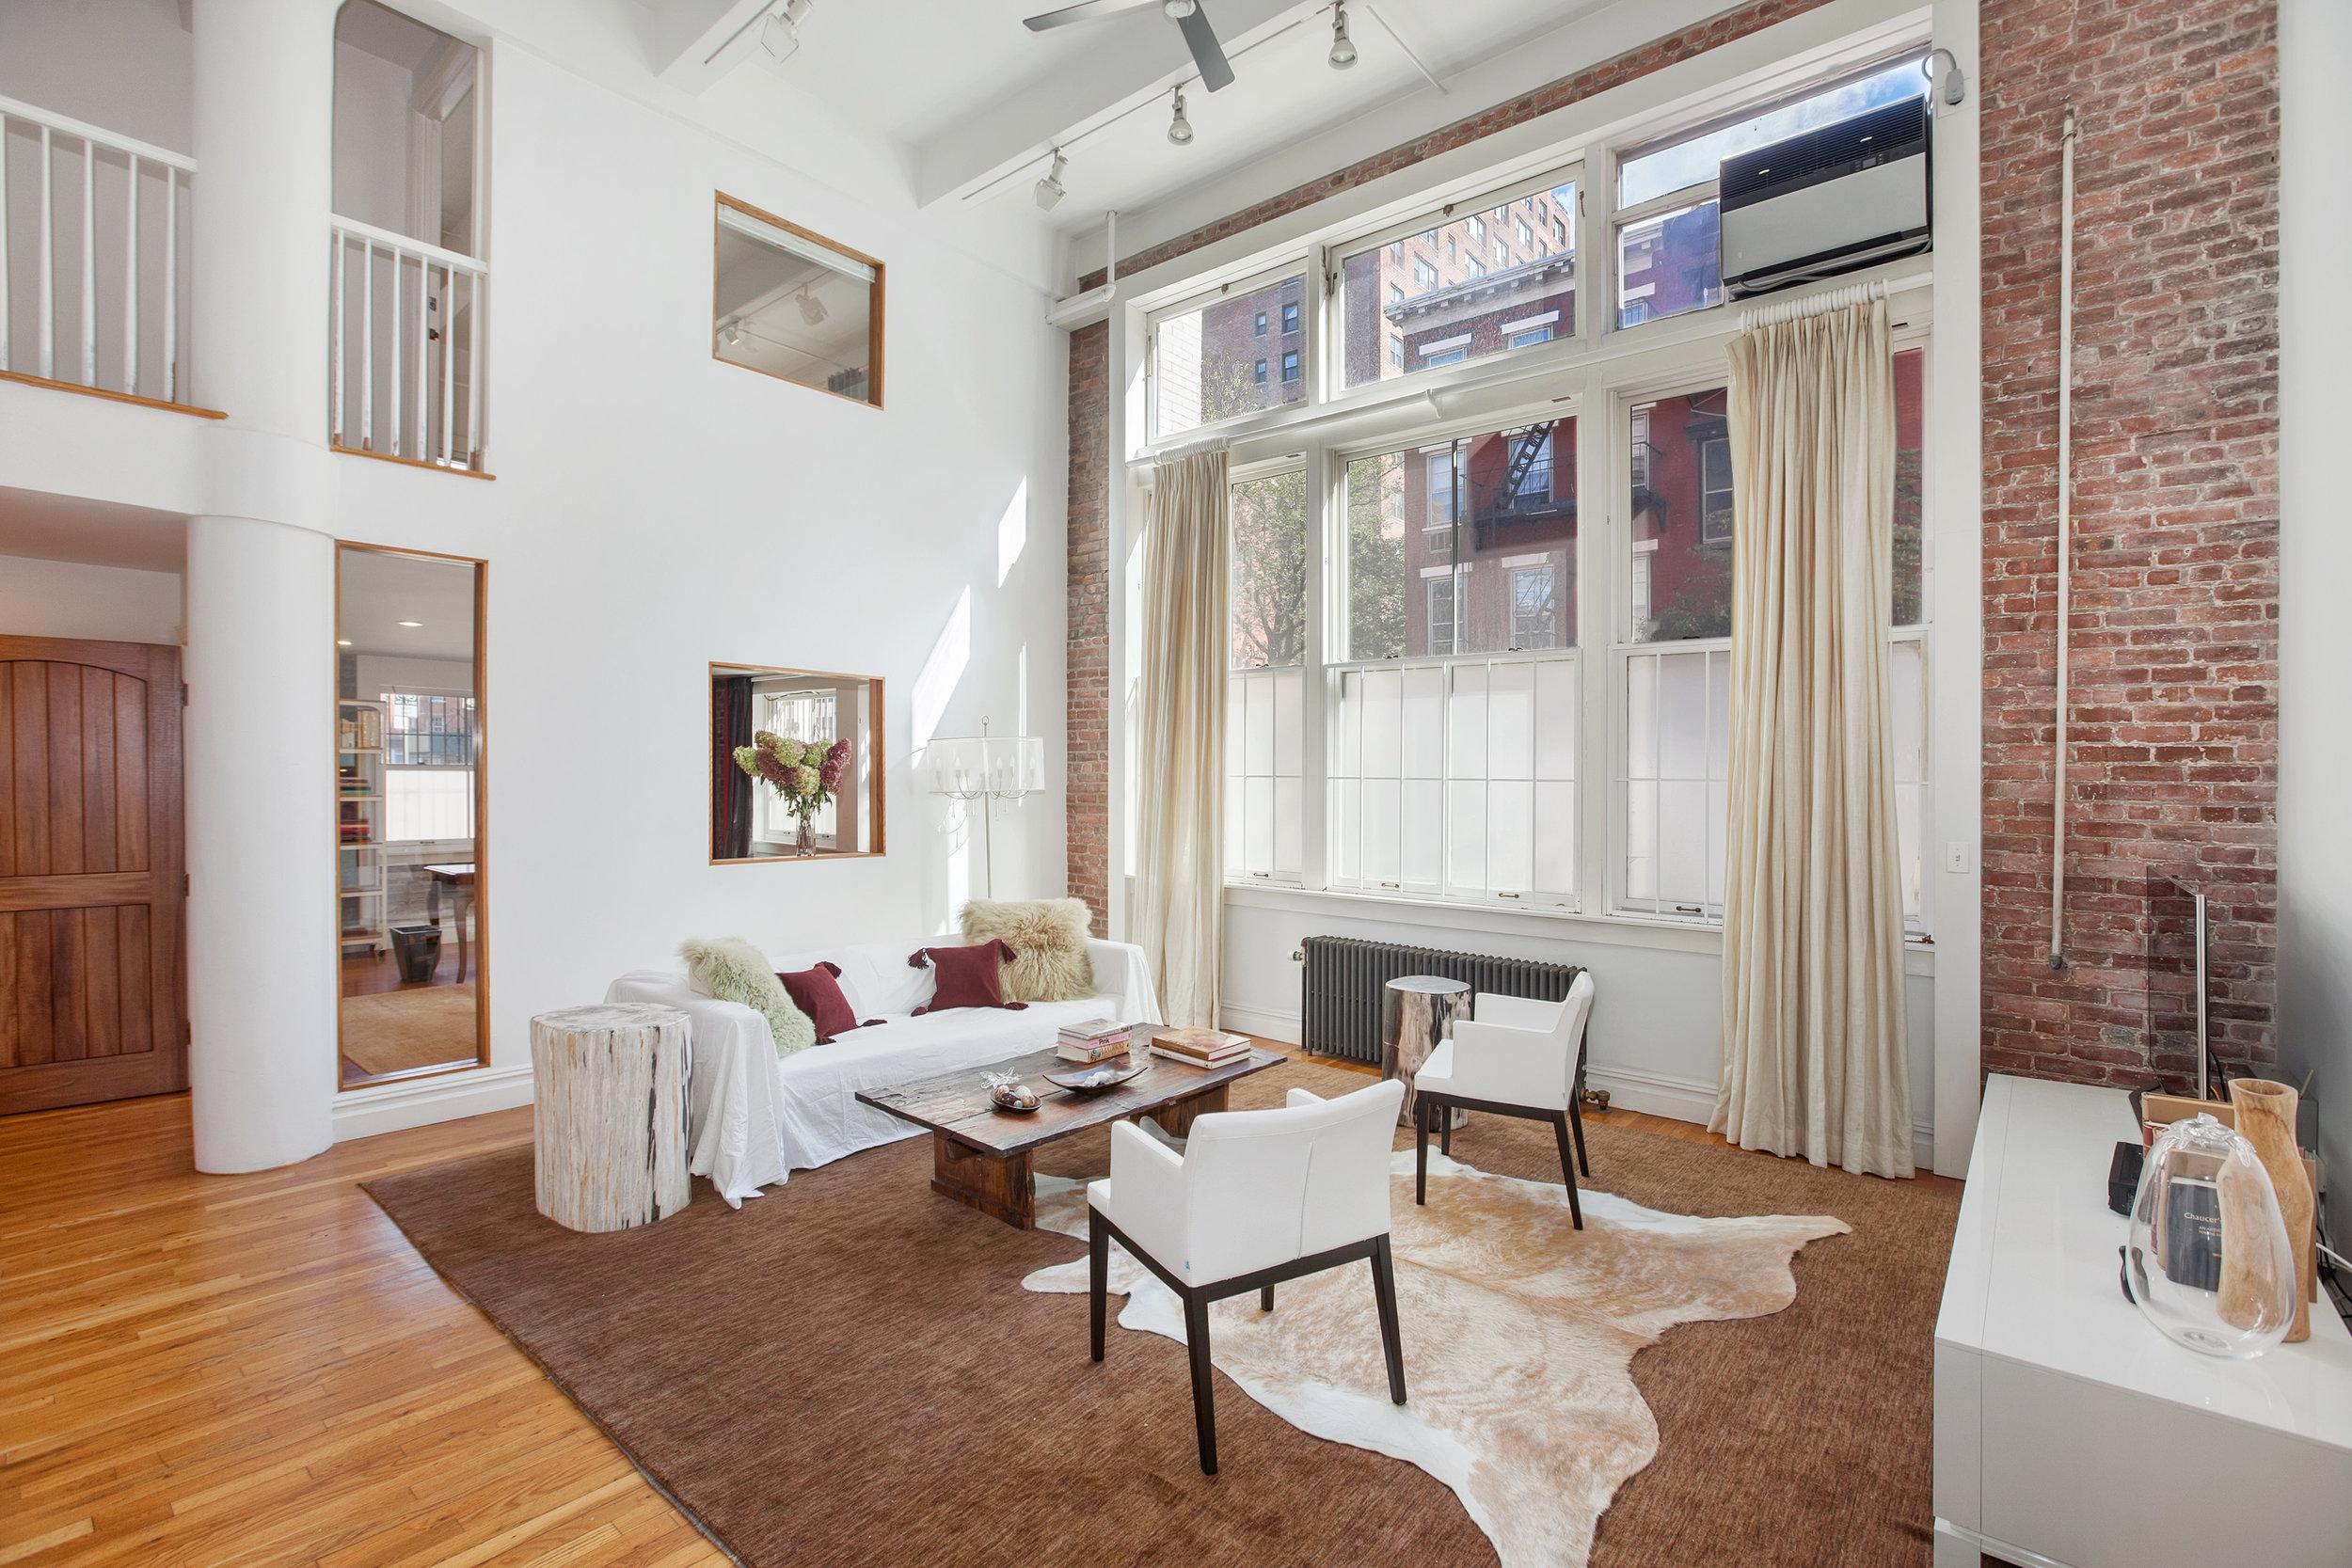 68 Jane Street, #1E - $5,250,000